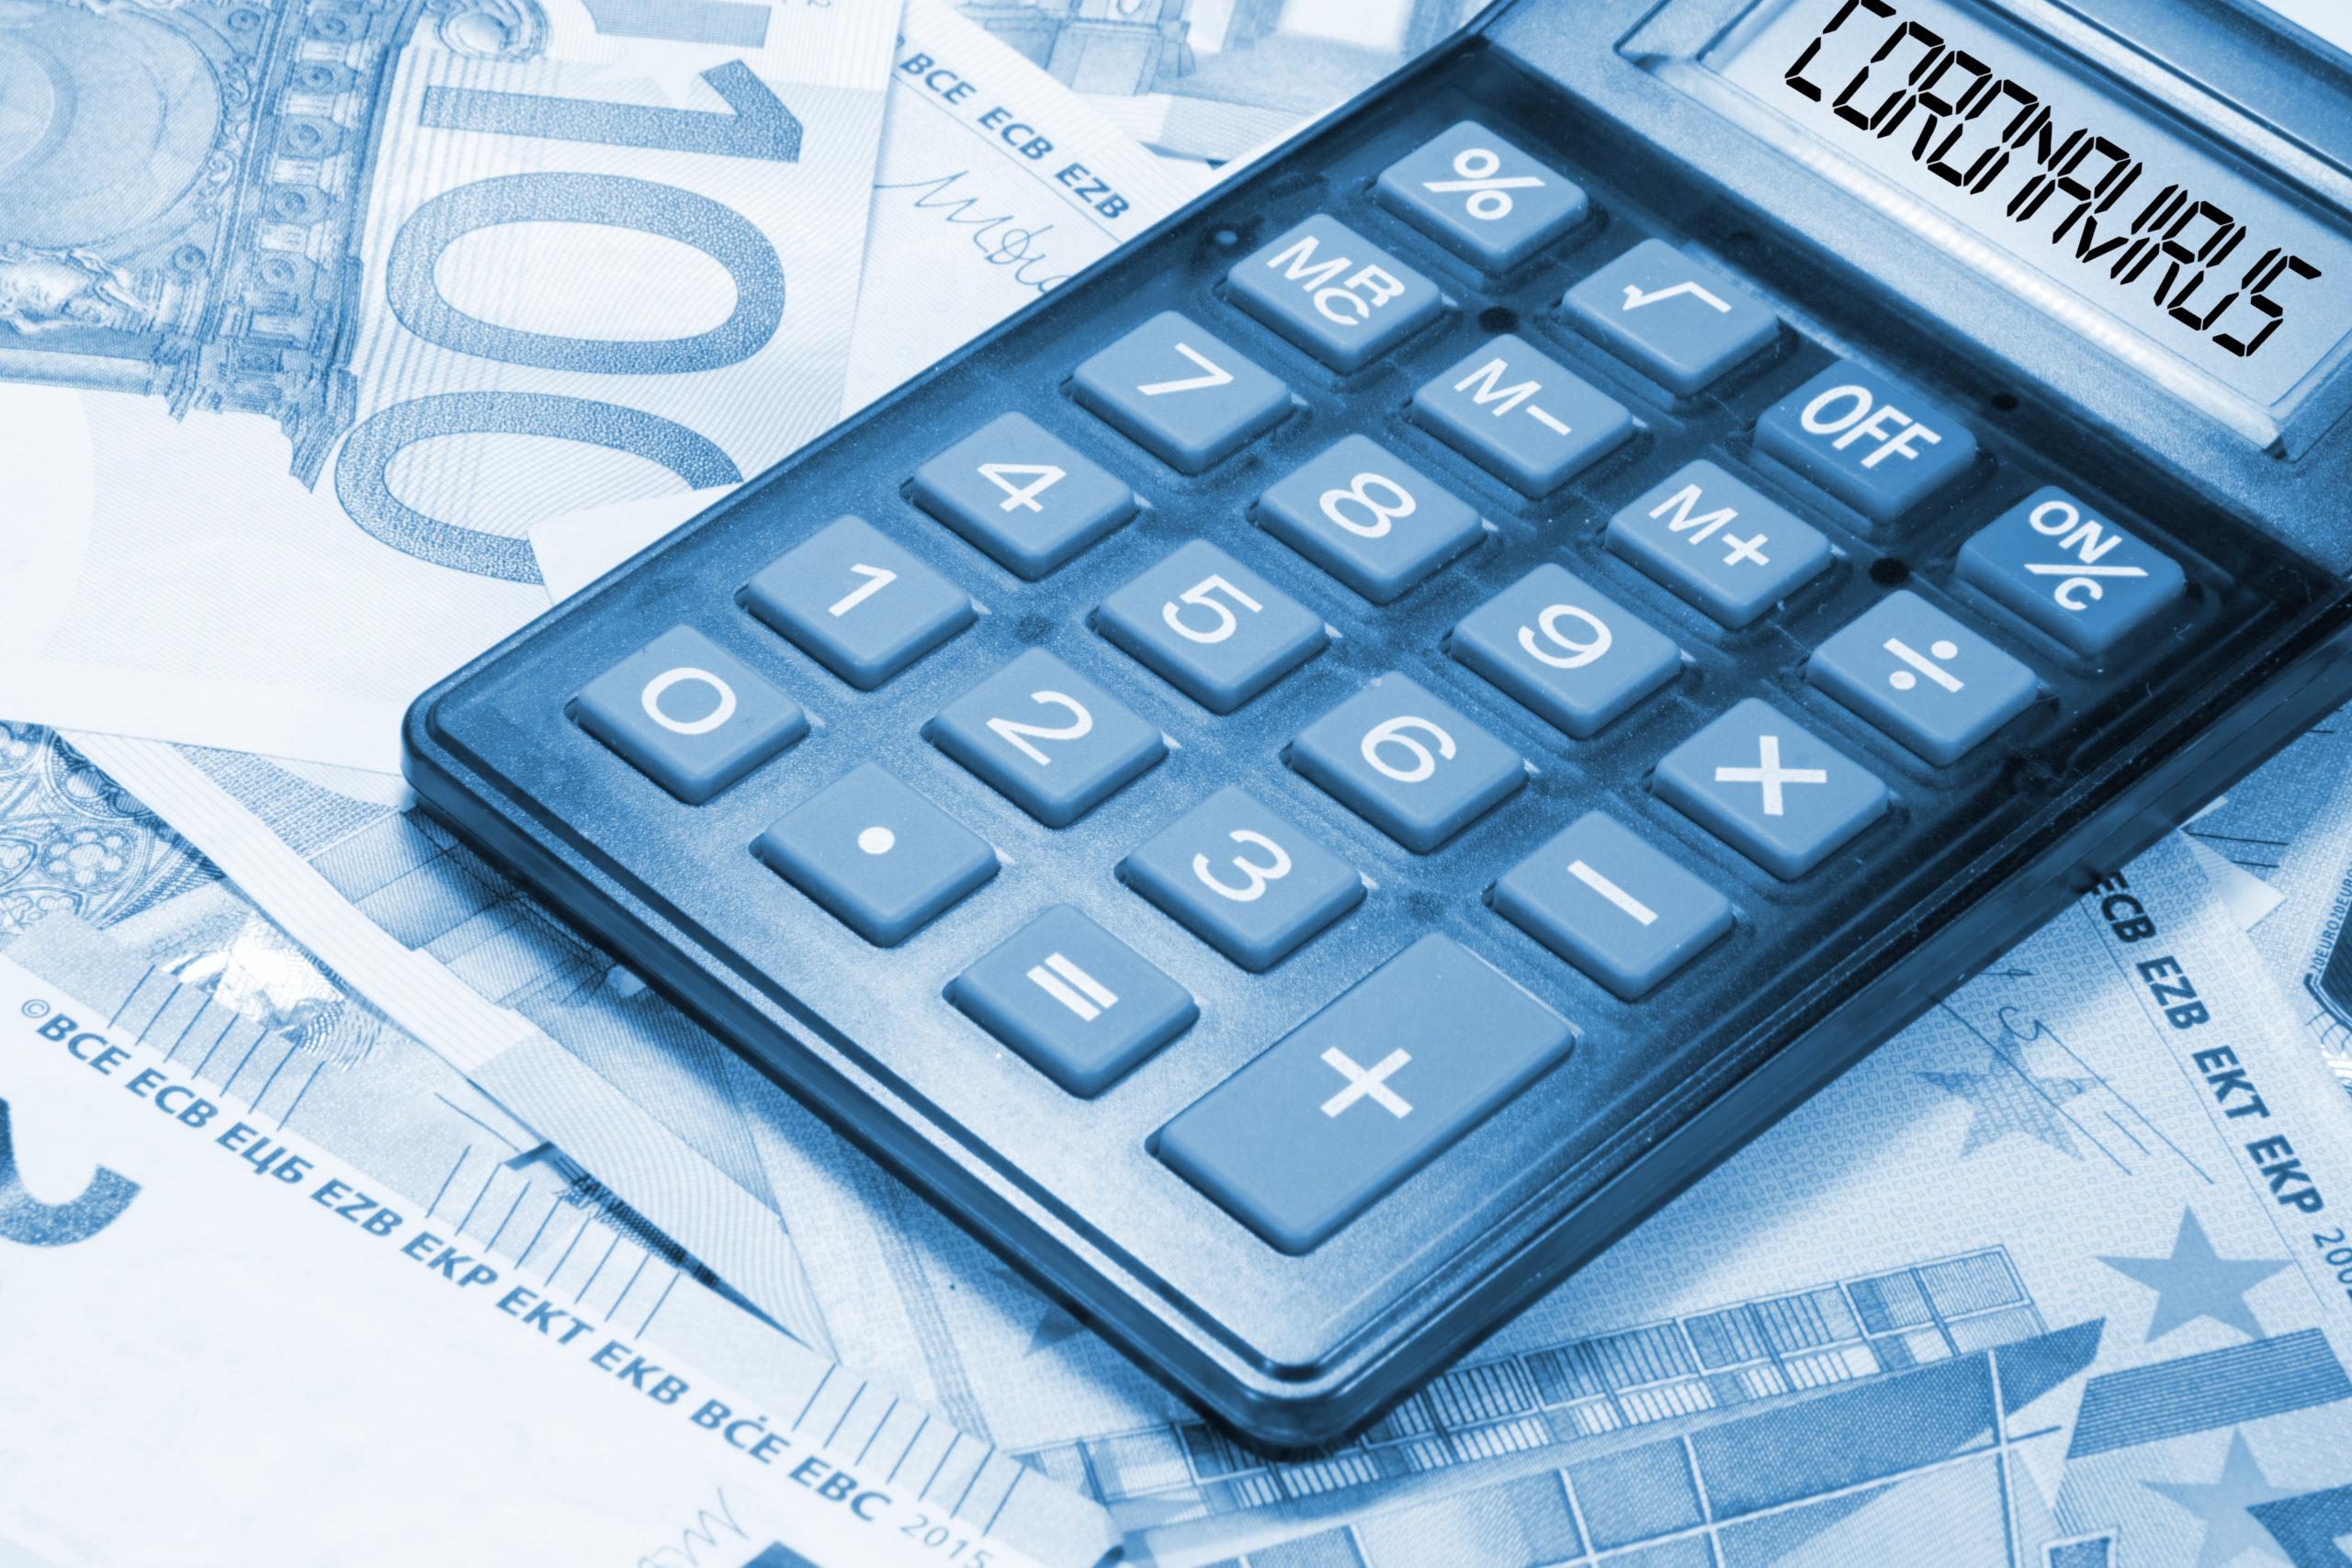 Corona Blog: Fixkostenzuschuss 2. Tranche - 20.8.2020